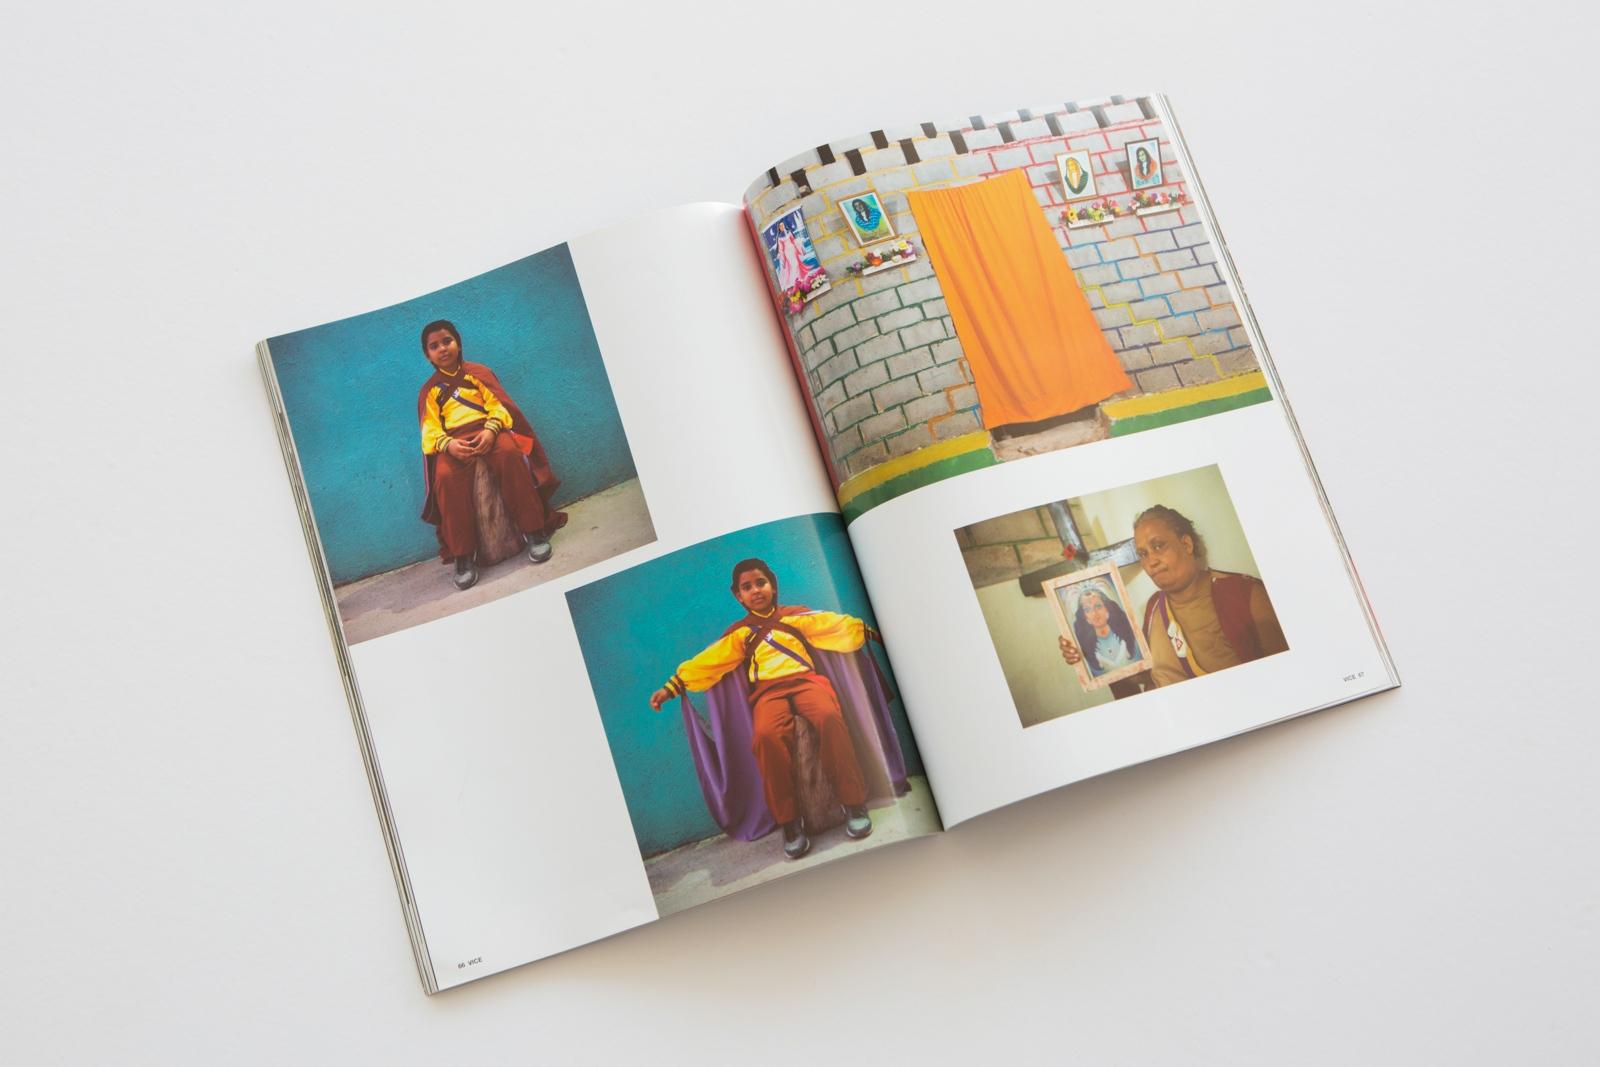 Vice Photo Issue 2016 . Nov.2016. Mexico.